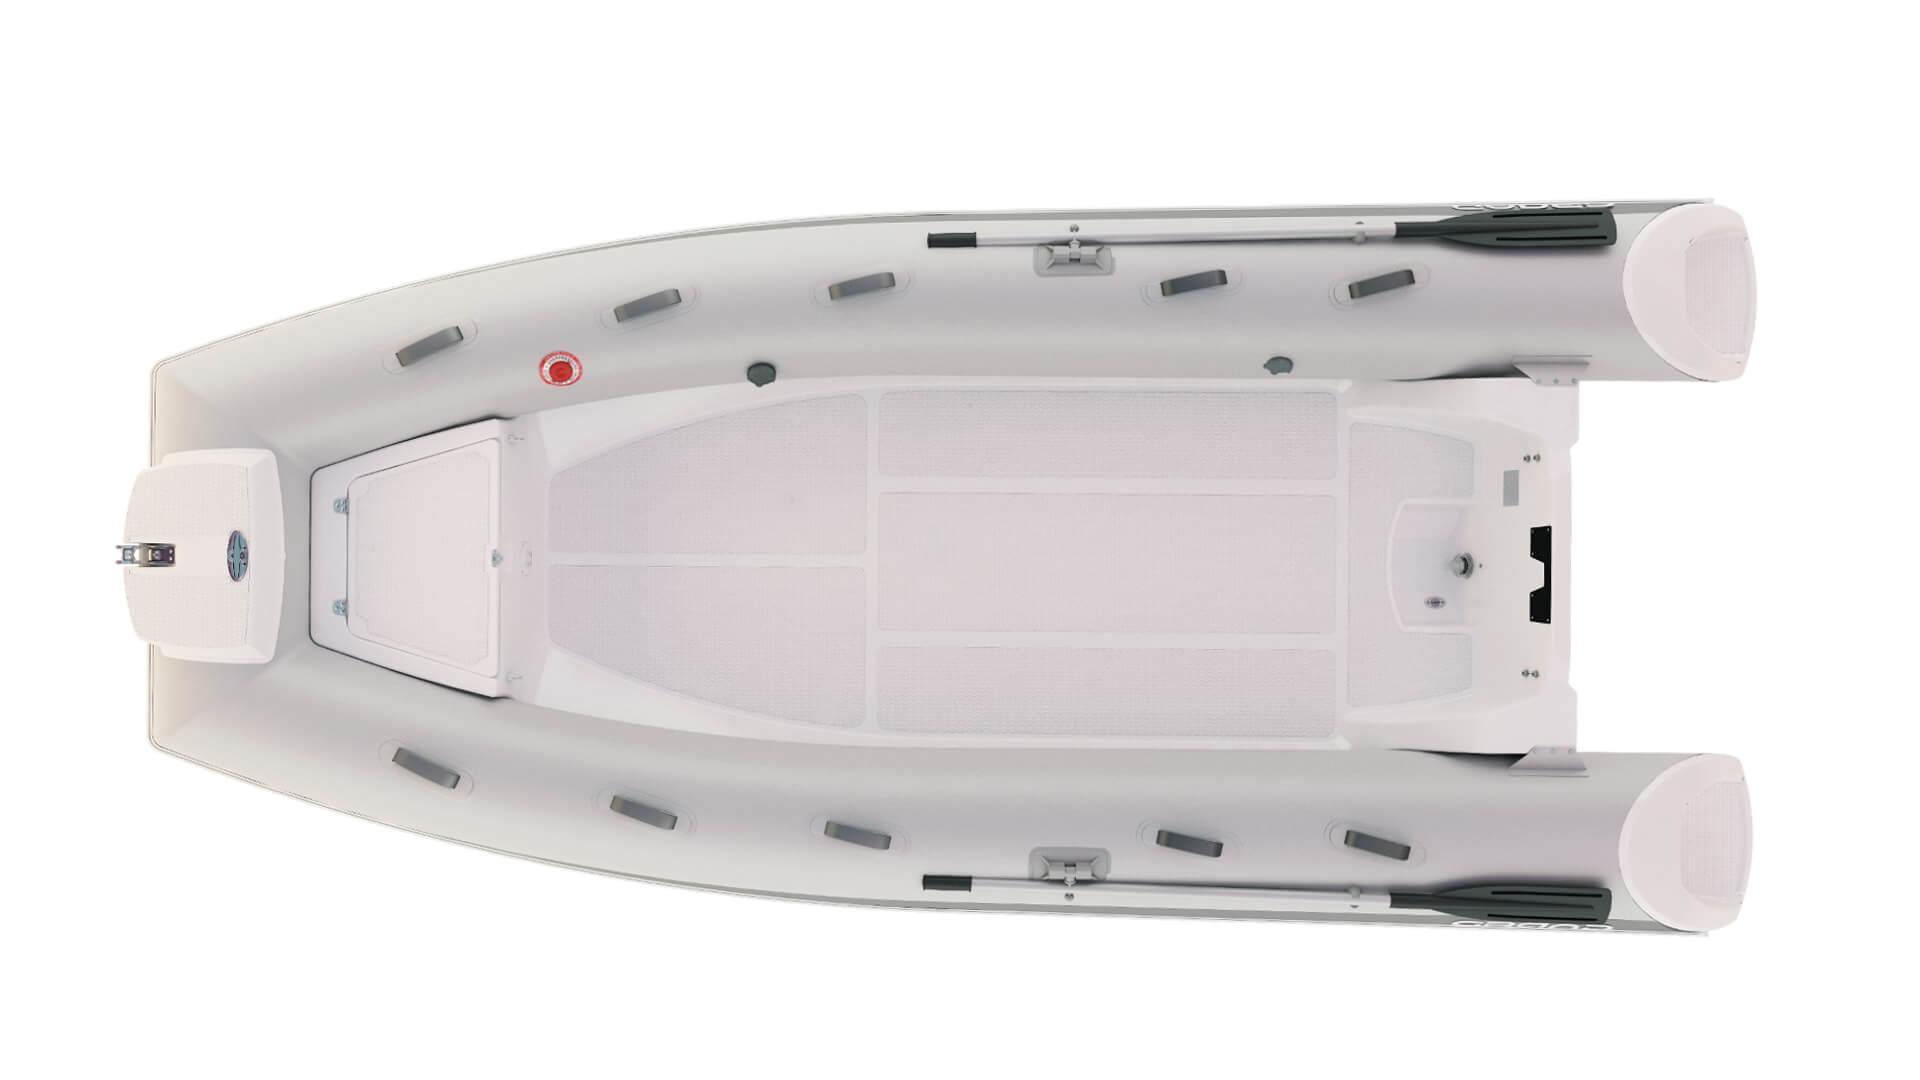 Надувная лодка с жестким дном GRAND Silver Line S470N, Надувная лодка GRAND Silver Line S470N, GRAND Silver Line S470NF, GRAND Silver Line S470N, GRAND S470NF, GRAND S470N, GRAND S470, Надувная лодка GRAND, Надувная лодка ГРАНД, Надувная лодка с жестким дном, RIB, Rigid Inflatable Boats